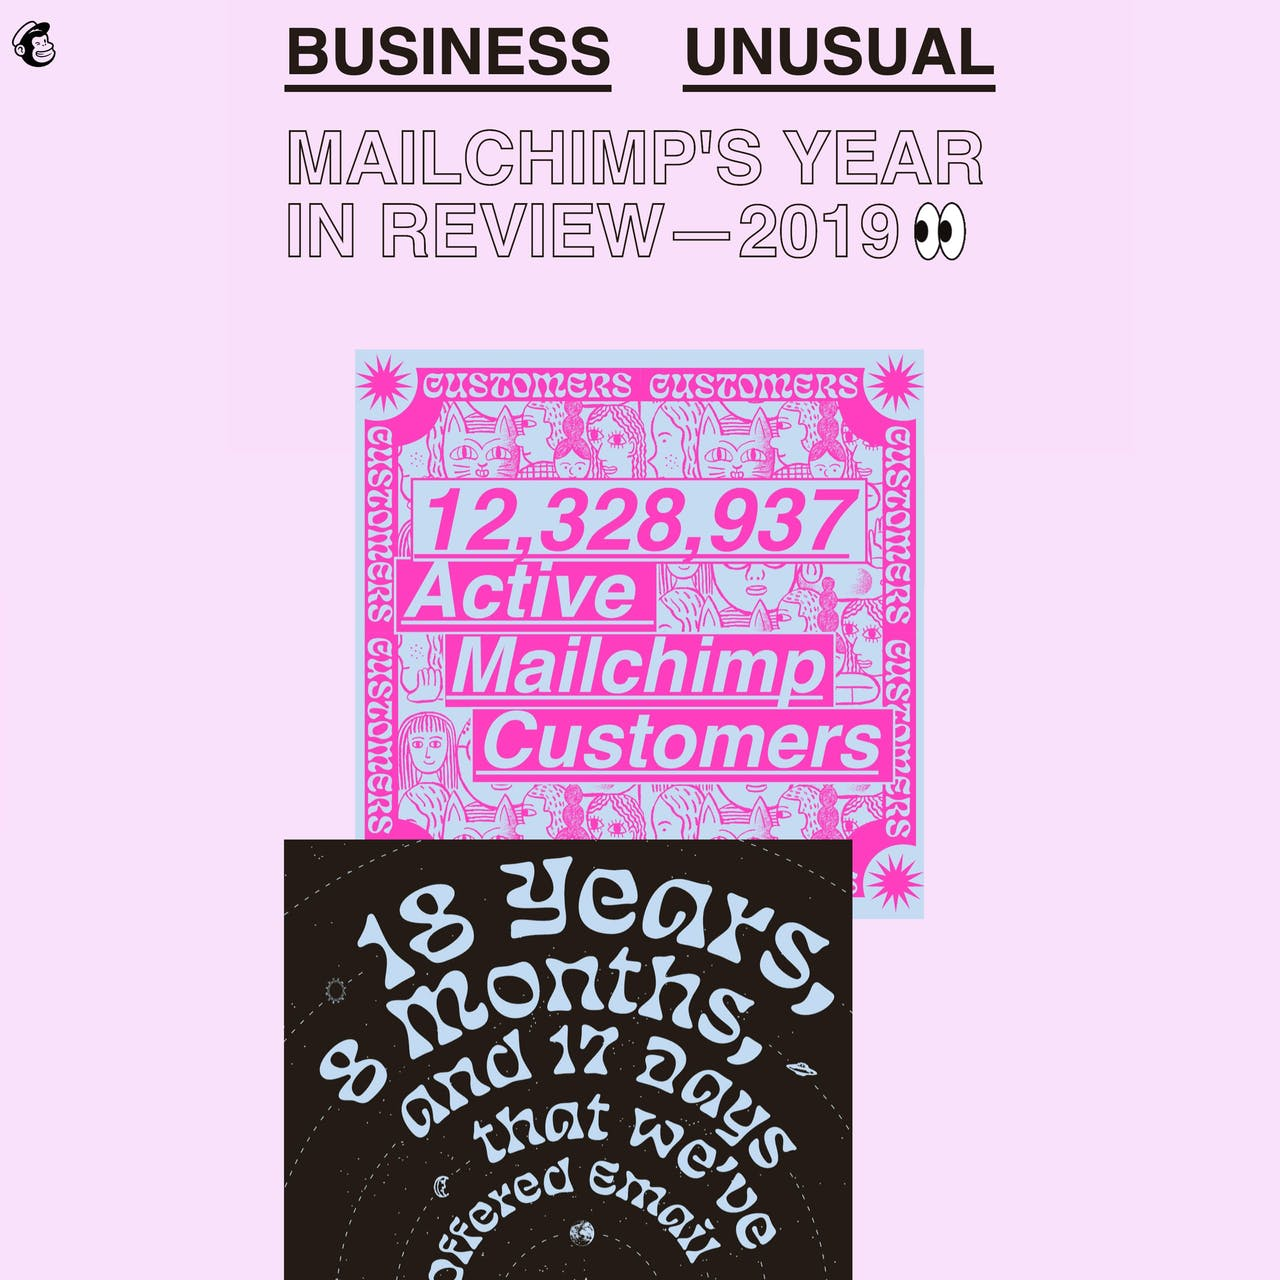 Mailchimp's 2019 Annual Report Website Screenshot